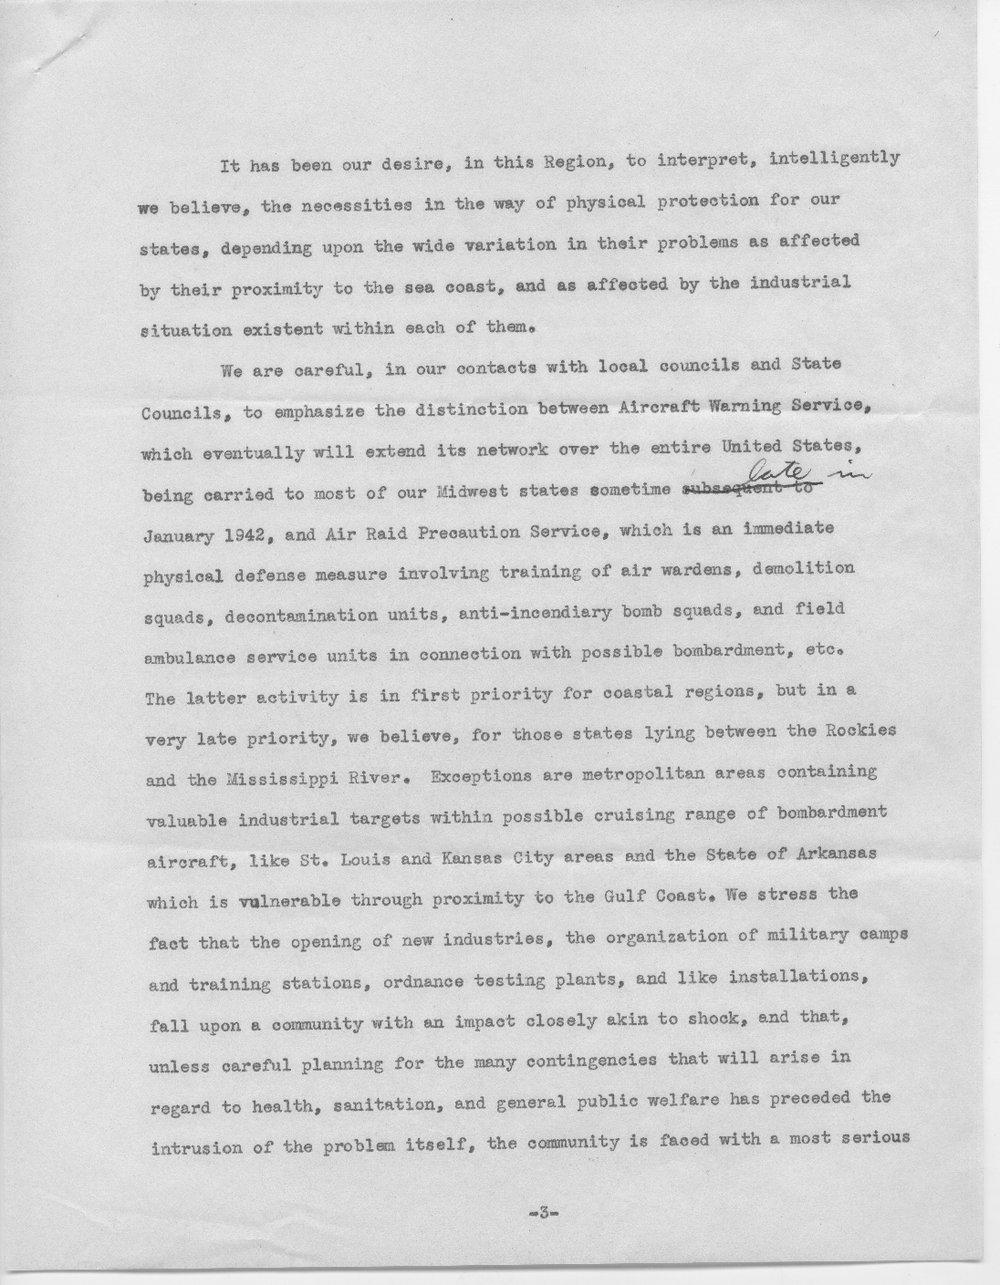 Address by Col. E.L. Wilbur - 3